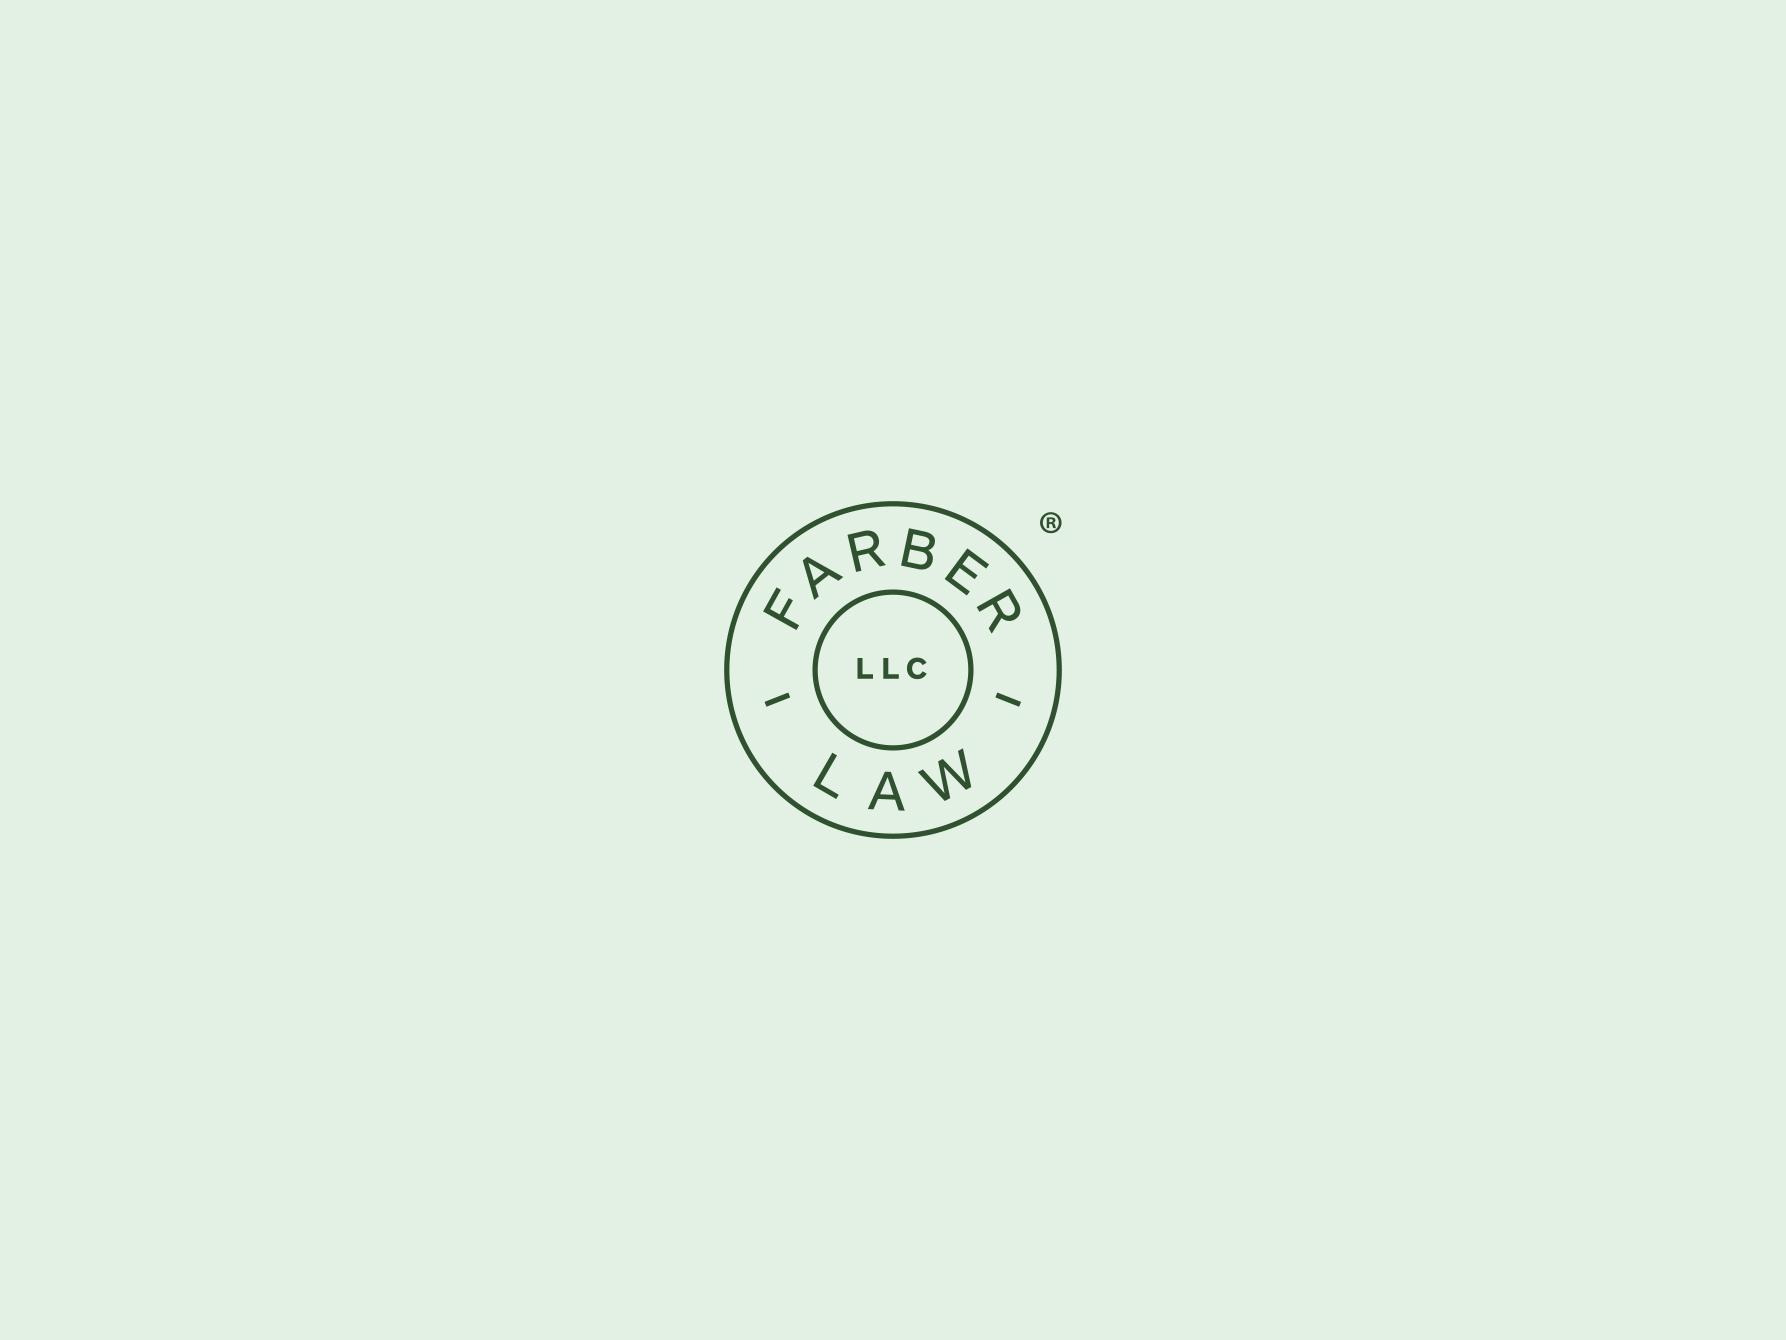 Farber-1.jpg